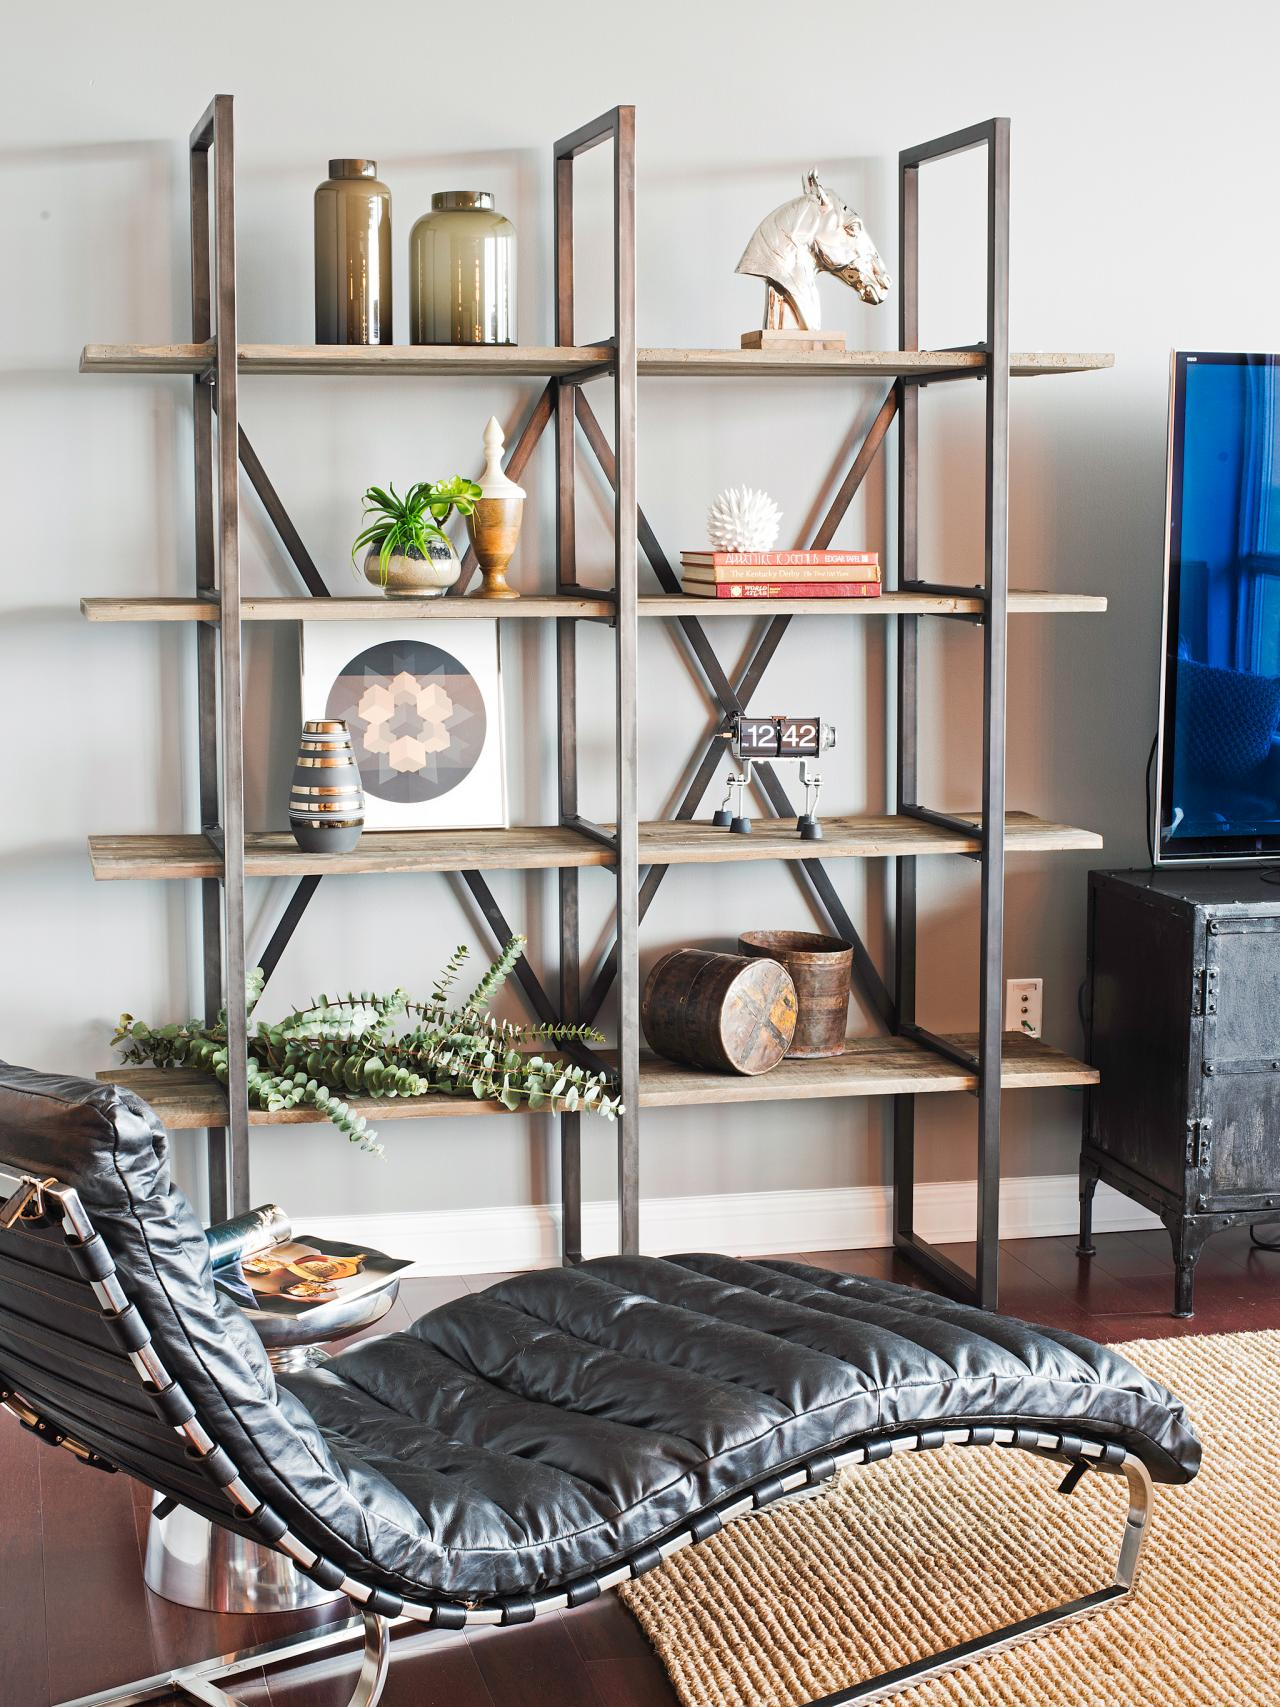 HSTAR8_Jessie-Miller-Portfolio-Bachelor-Pad-Media-Room-Bookshelf-Chaise_v.jpg.rend.hgtvcom.1280.1707.jpeg